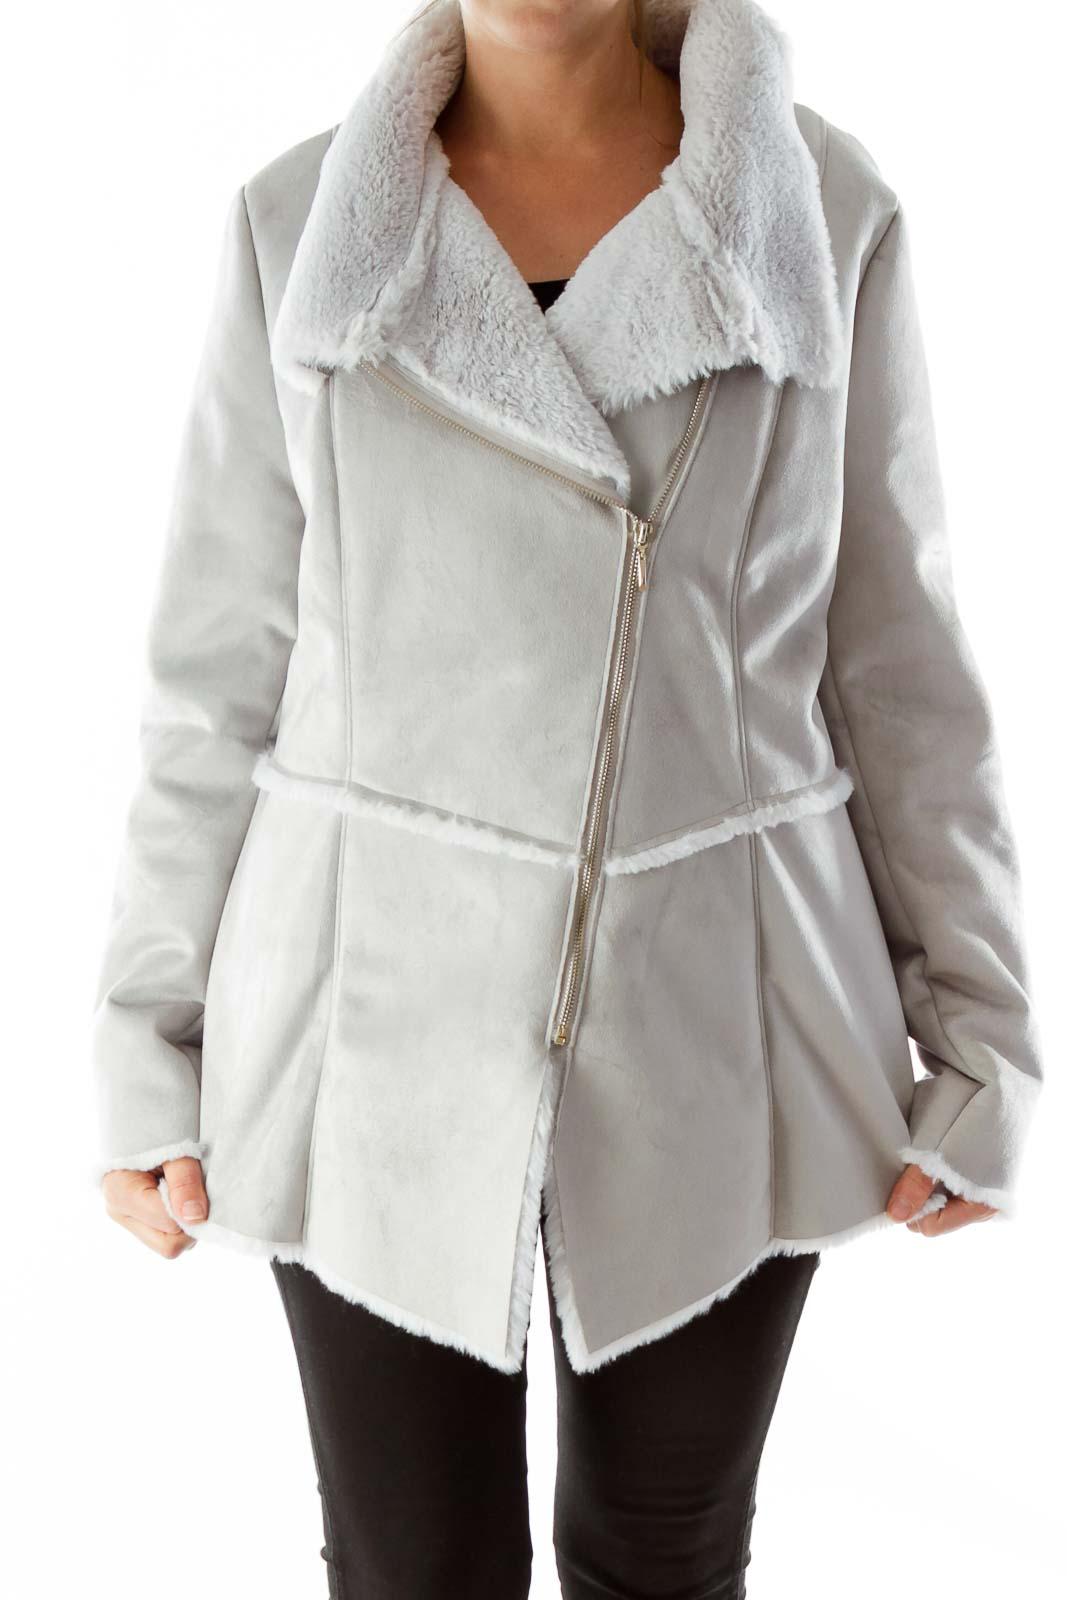 Gray Fur lined coat